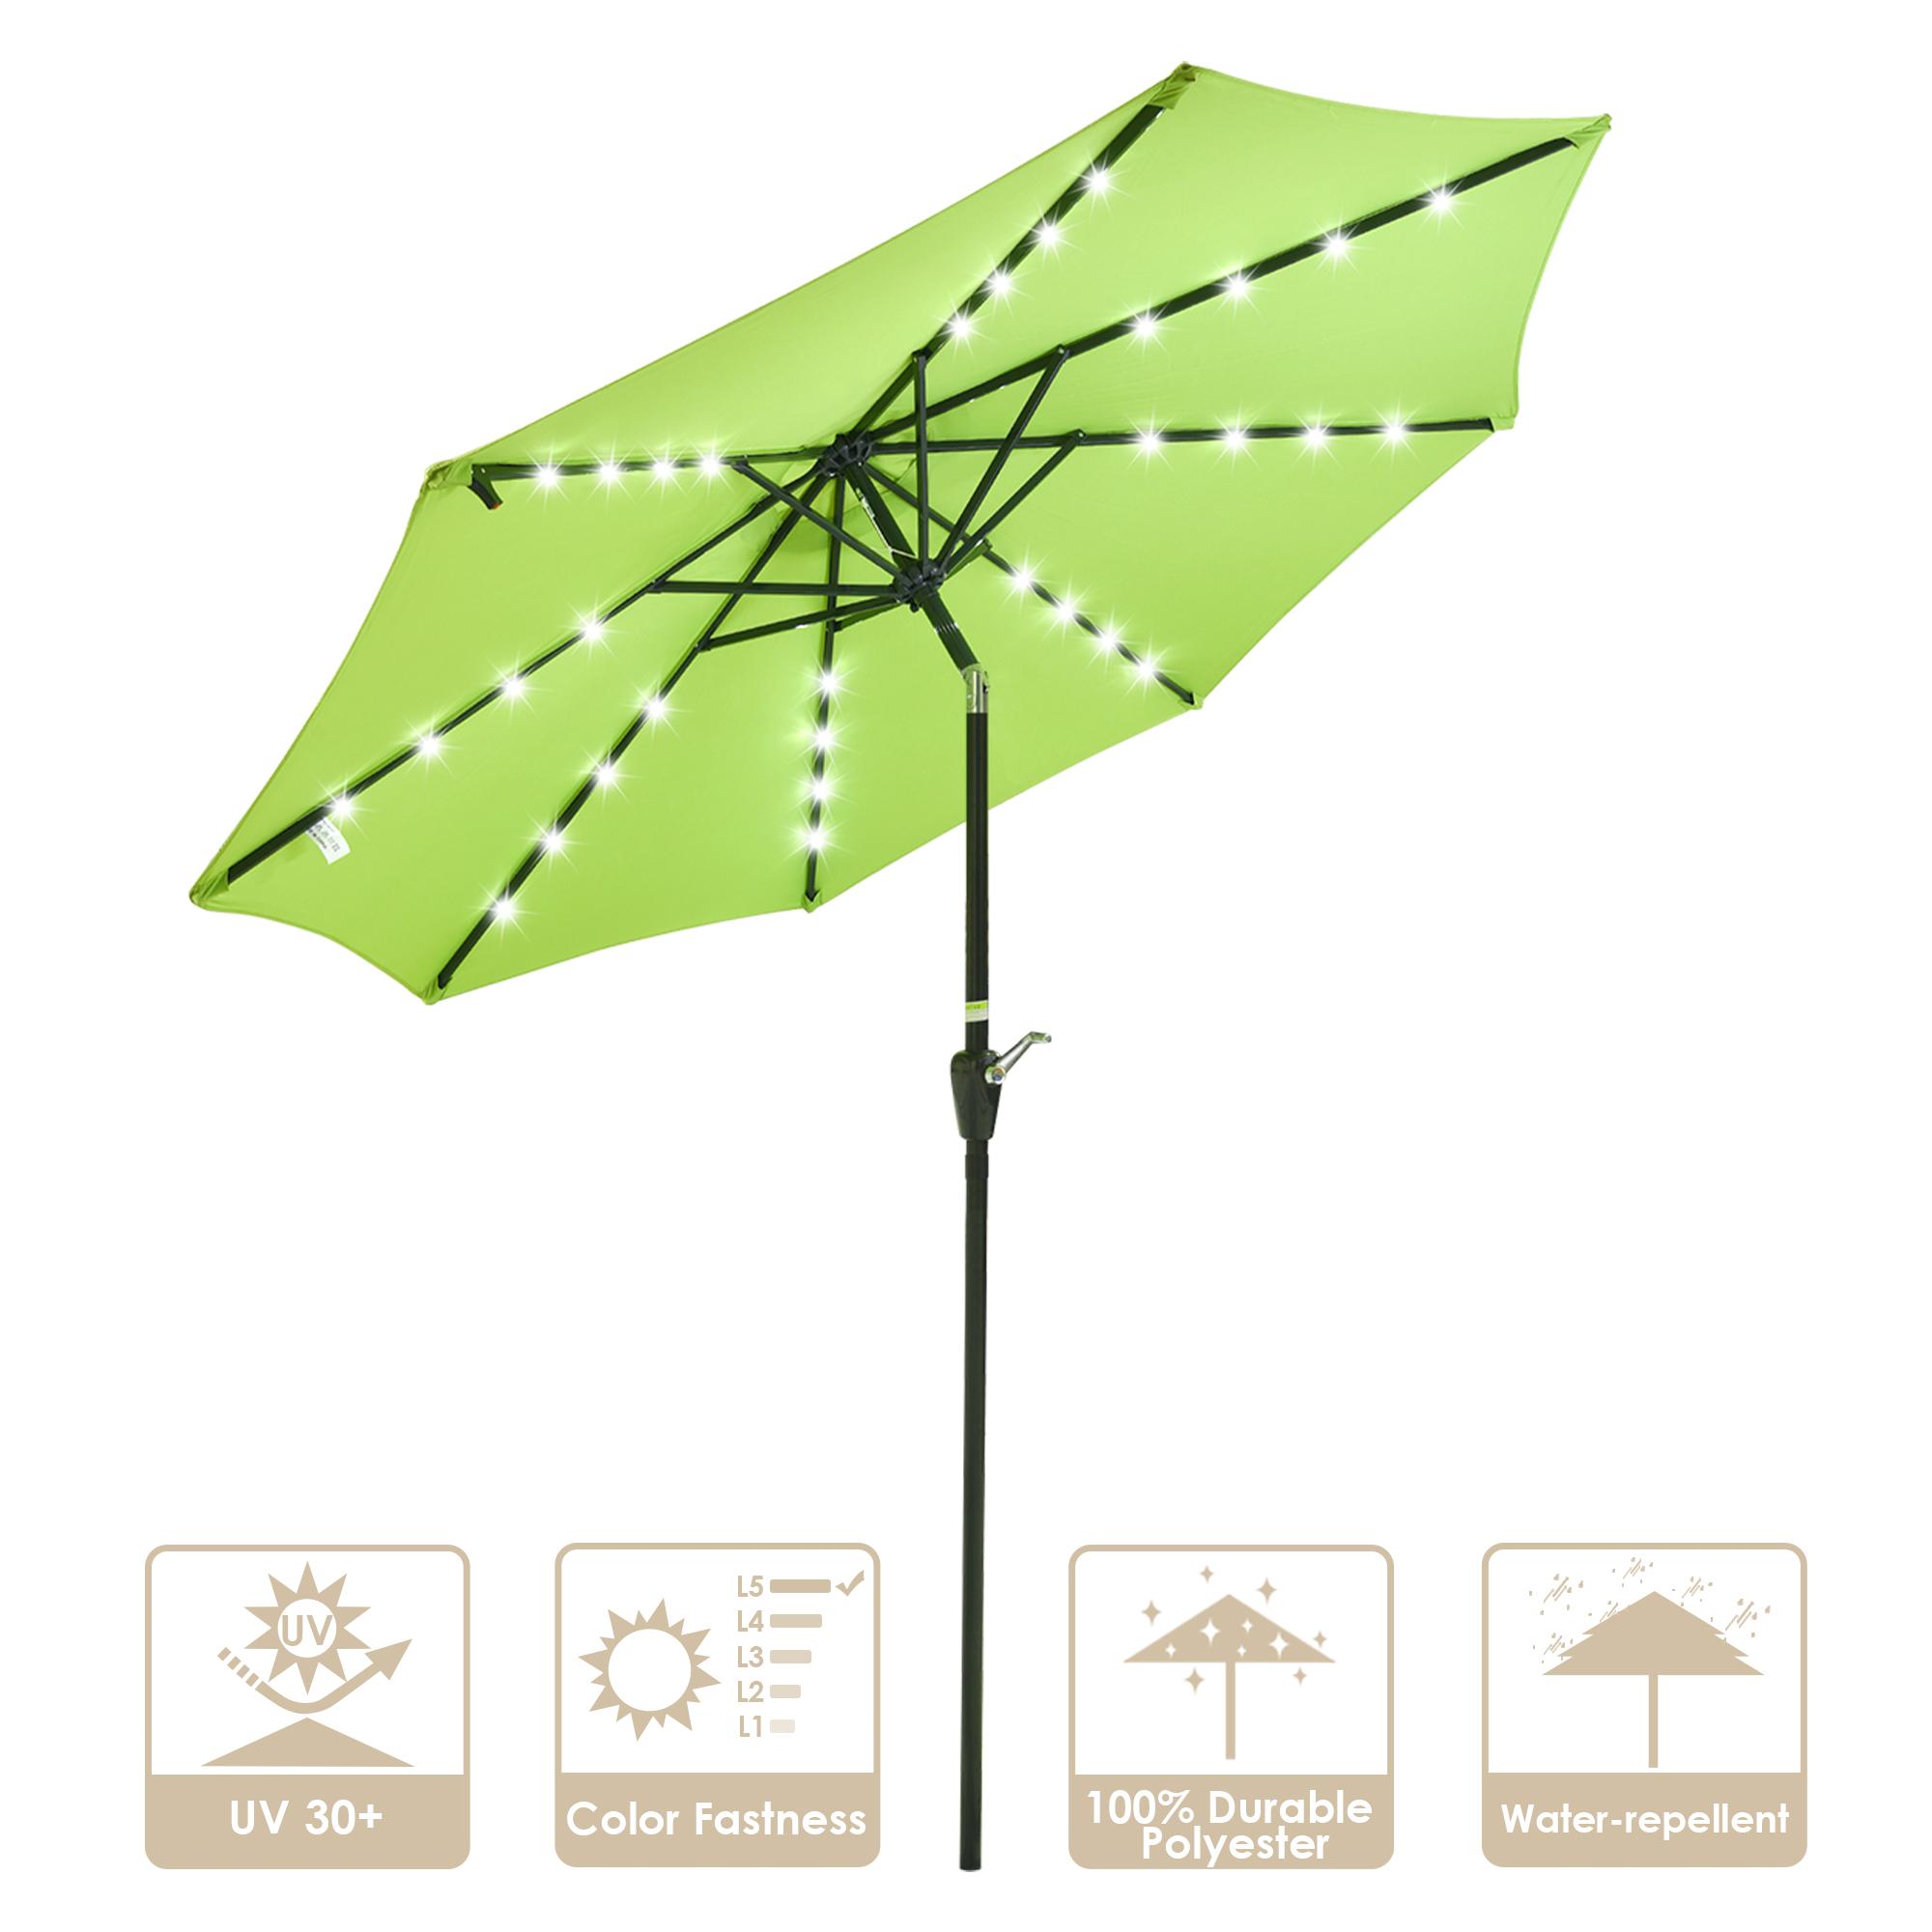 thumbnail 14 - 9' Patio Outdoor Umbrella Solar LED 8 Rib Garden Parasol Yard Deck Table Shade